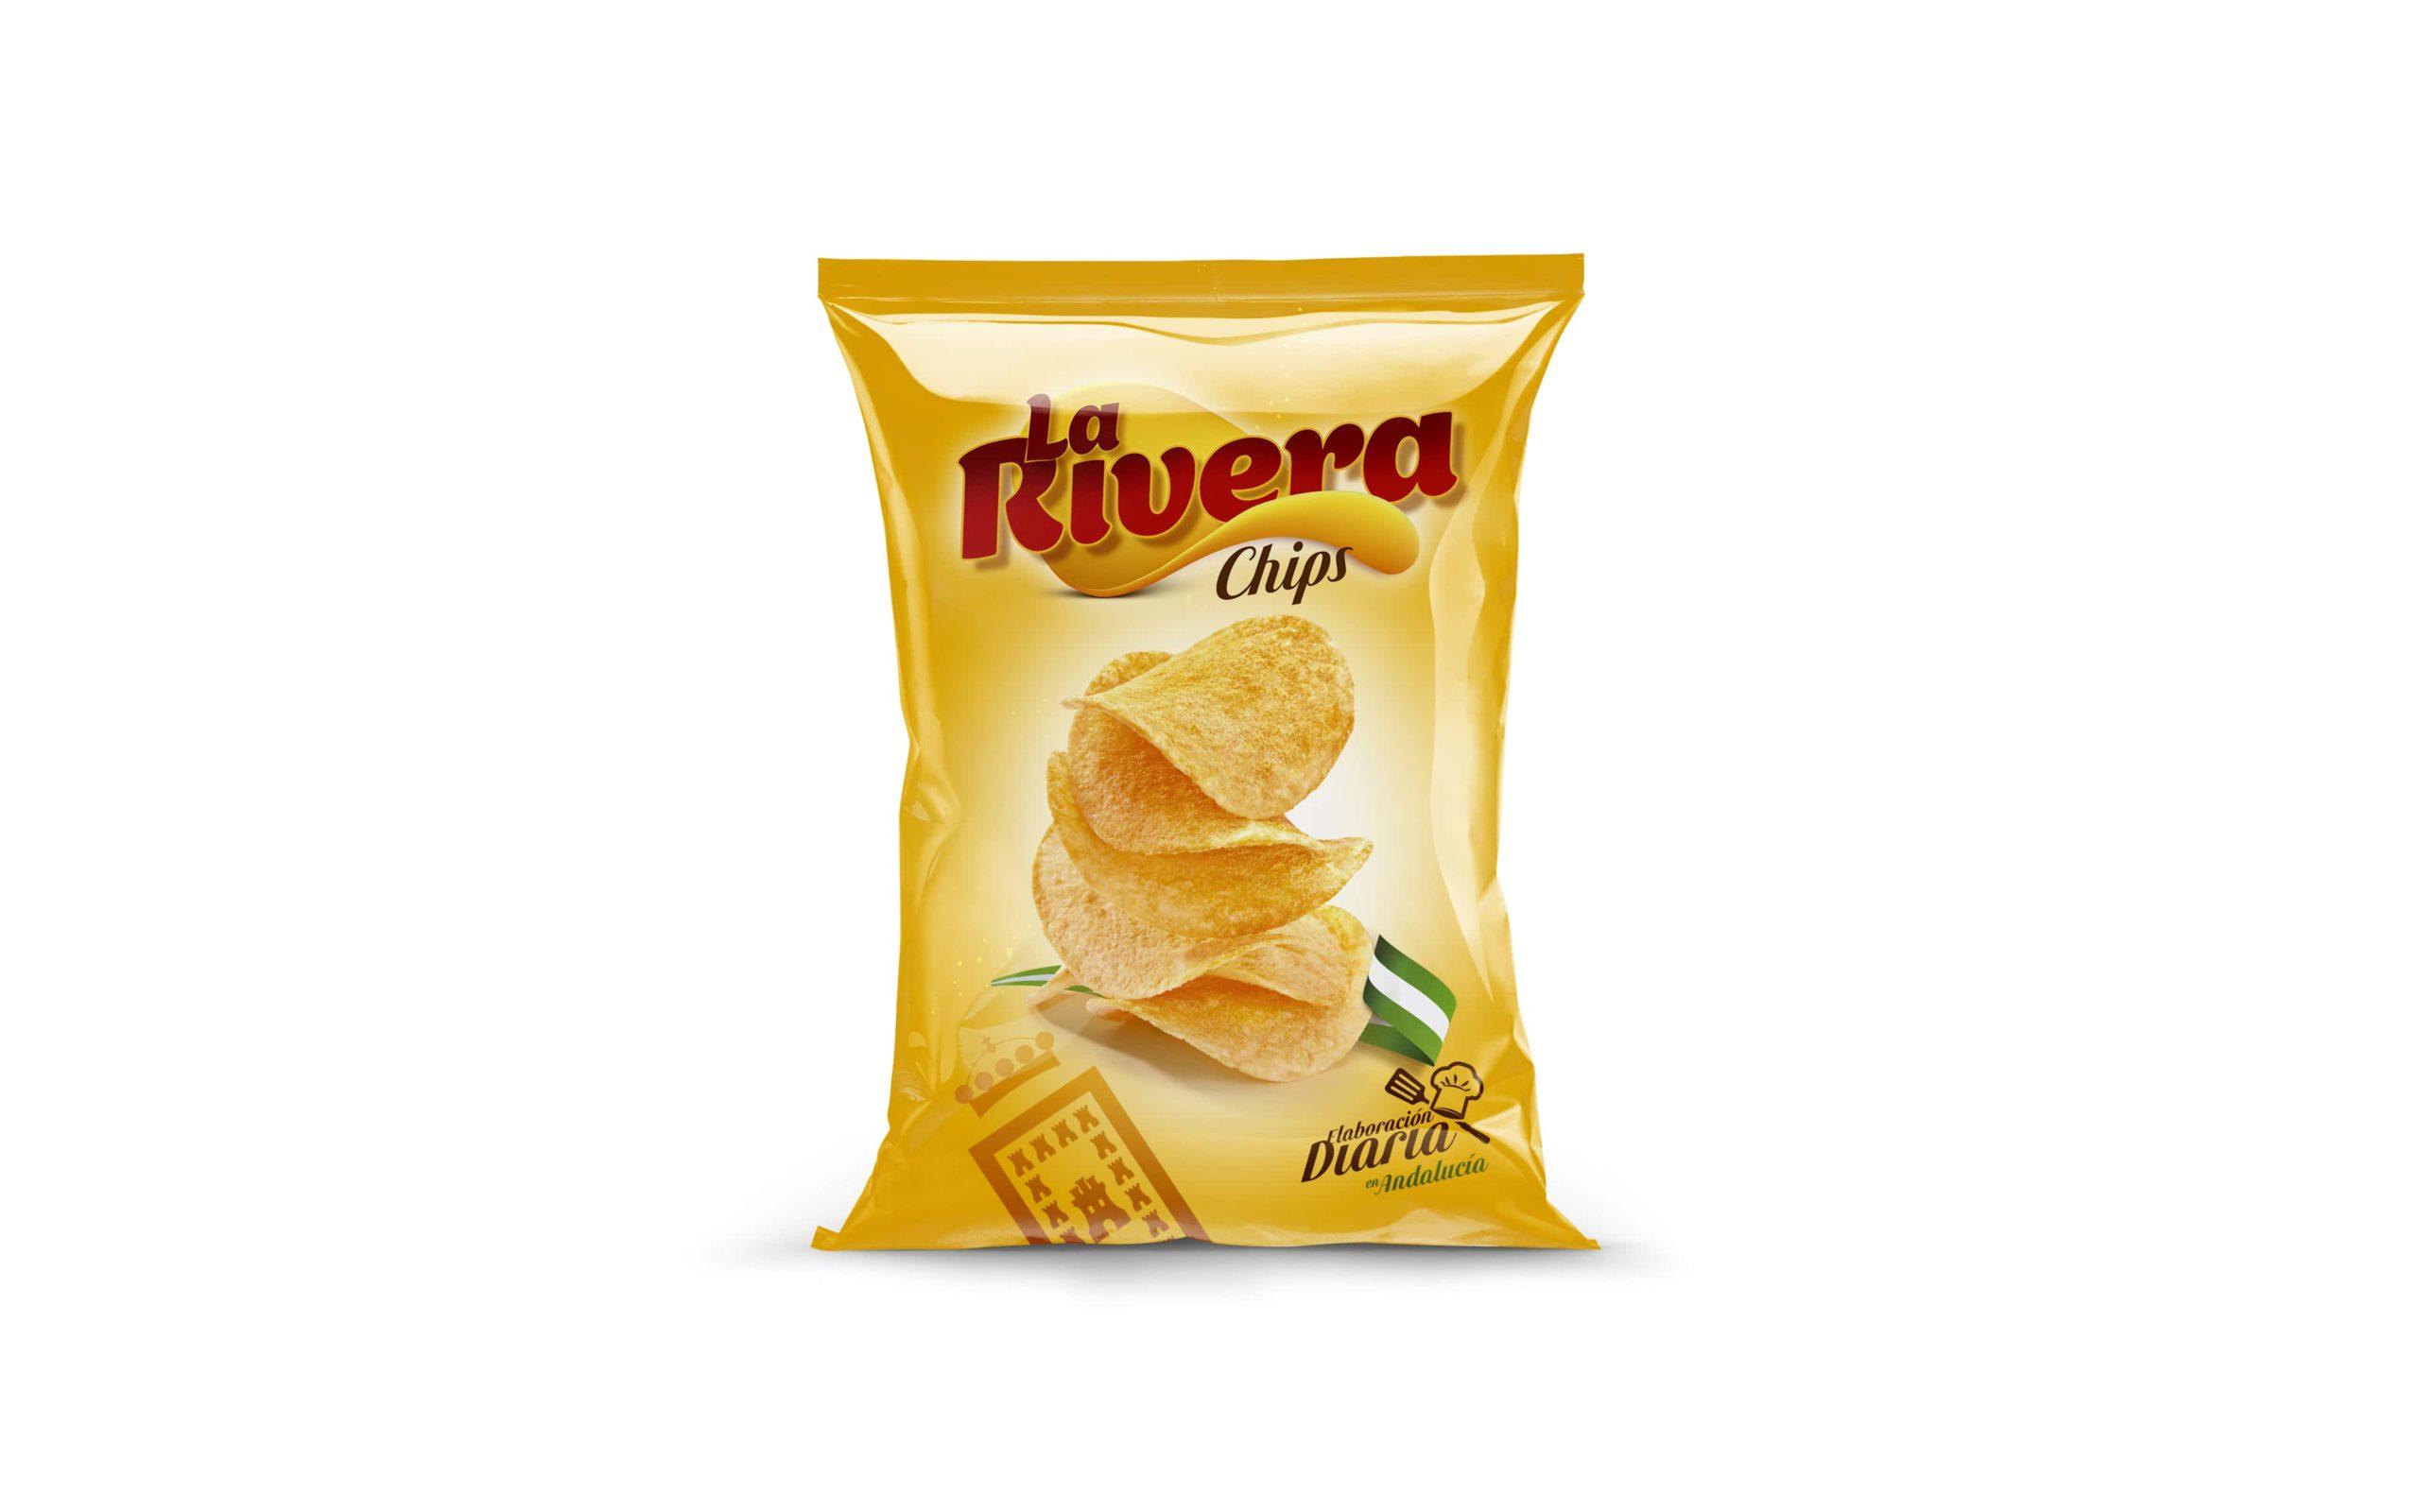 diseno-packaging-la-rivera-patatas-min